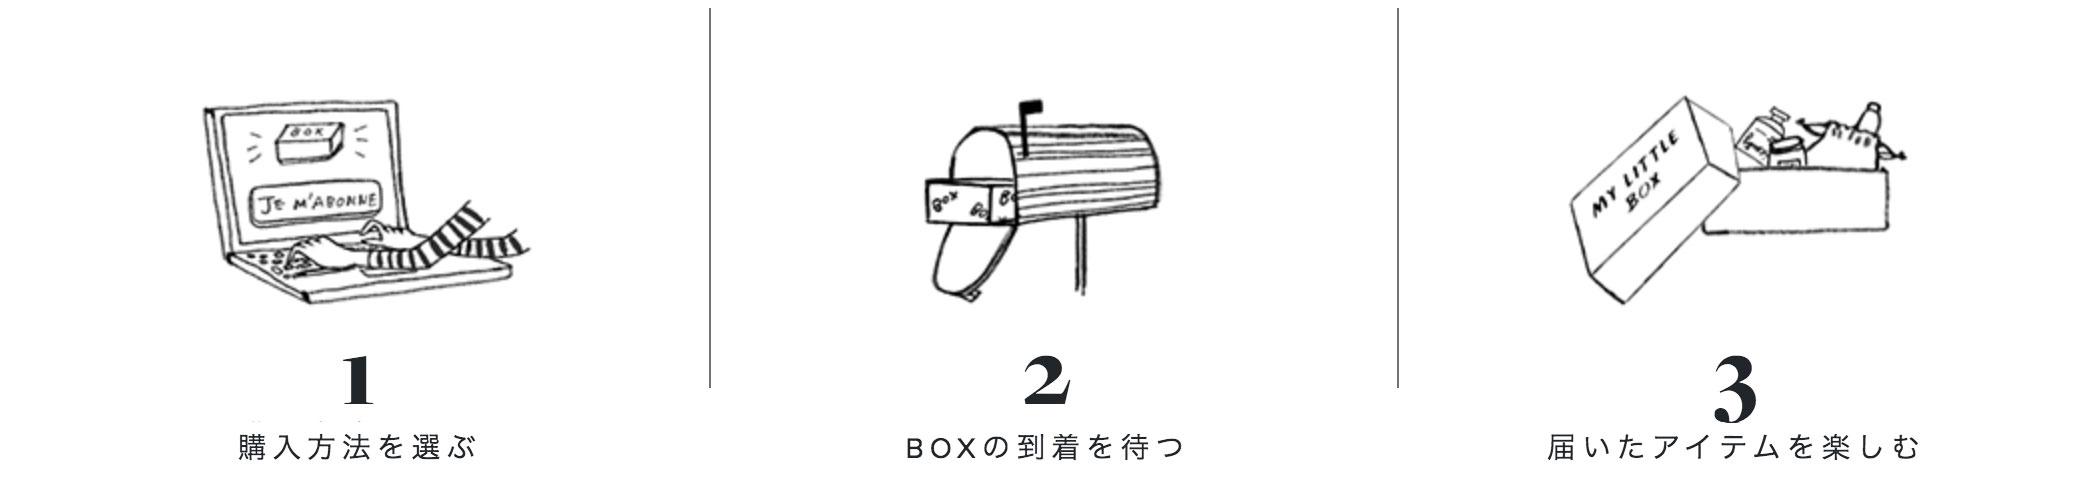 My Little Boxオーダーの仕方